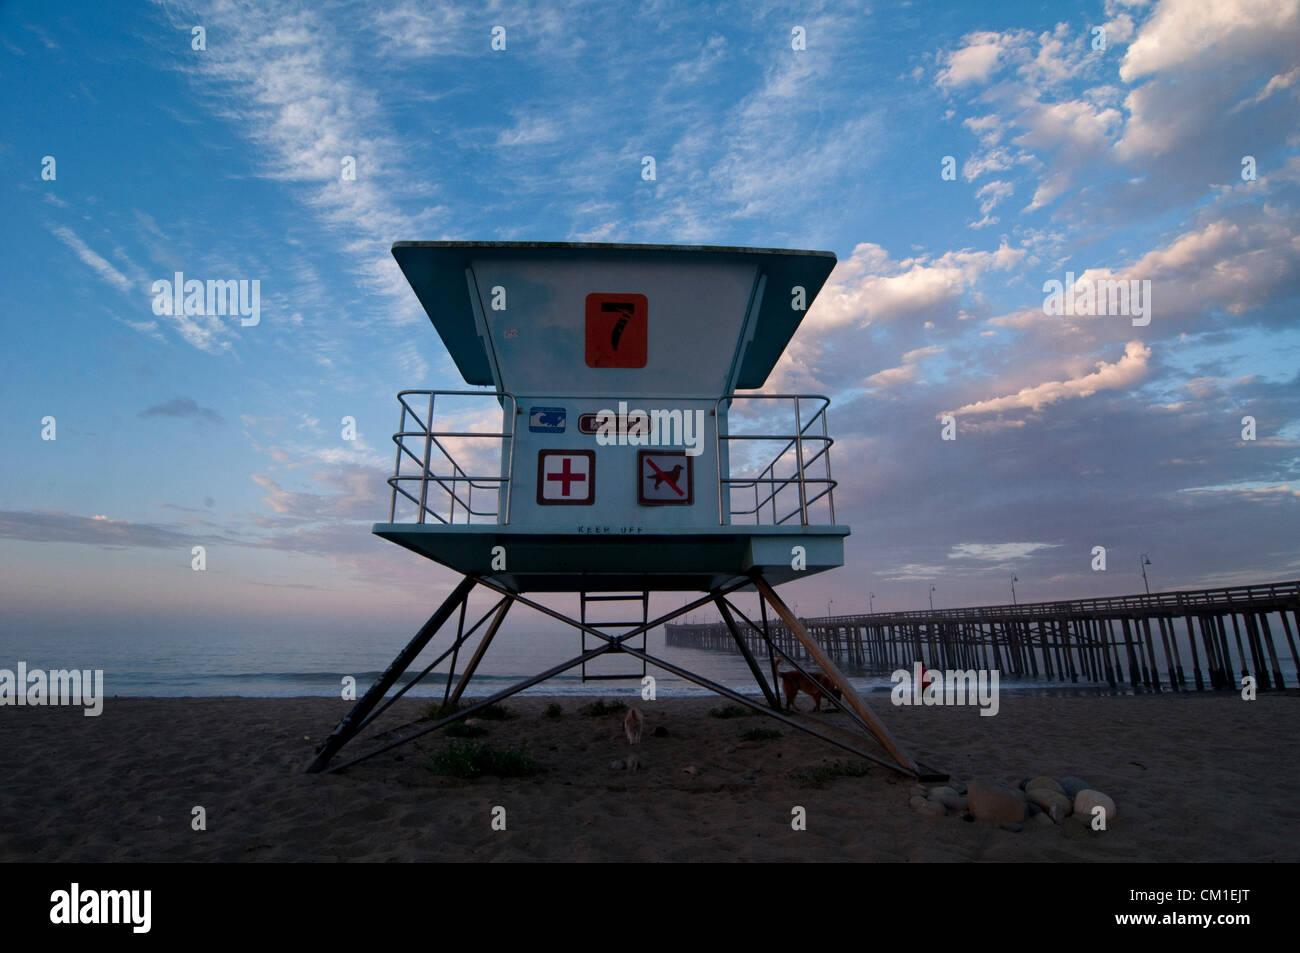 Aug. 29, 2012 - Ventura, Ca, USA - August 28, 2012 Ventura, Ca. USA. A lifegaurd tower on the beach near the Ventura Stock Photo